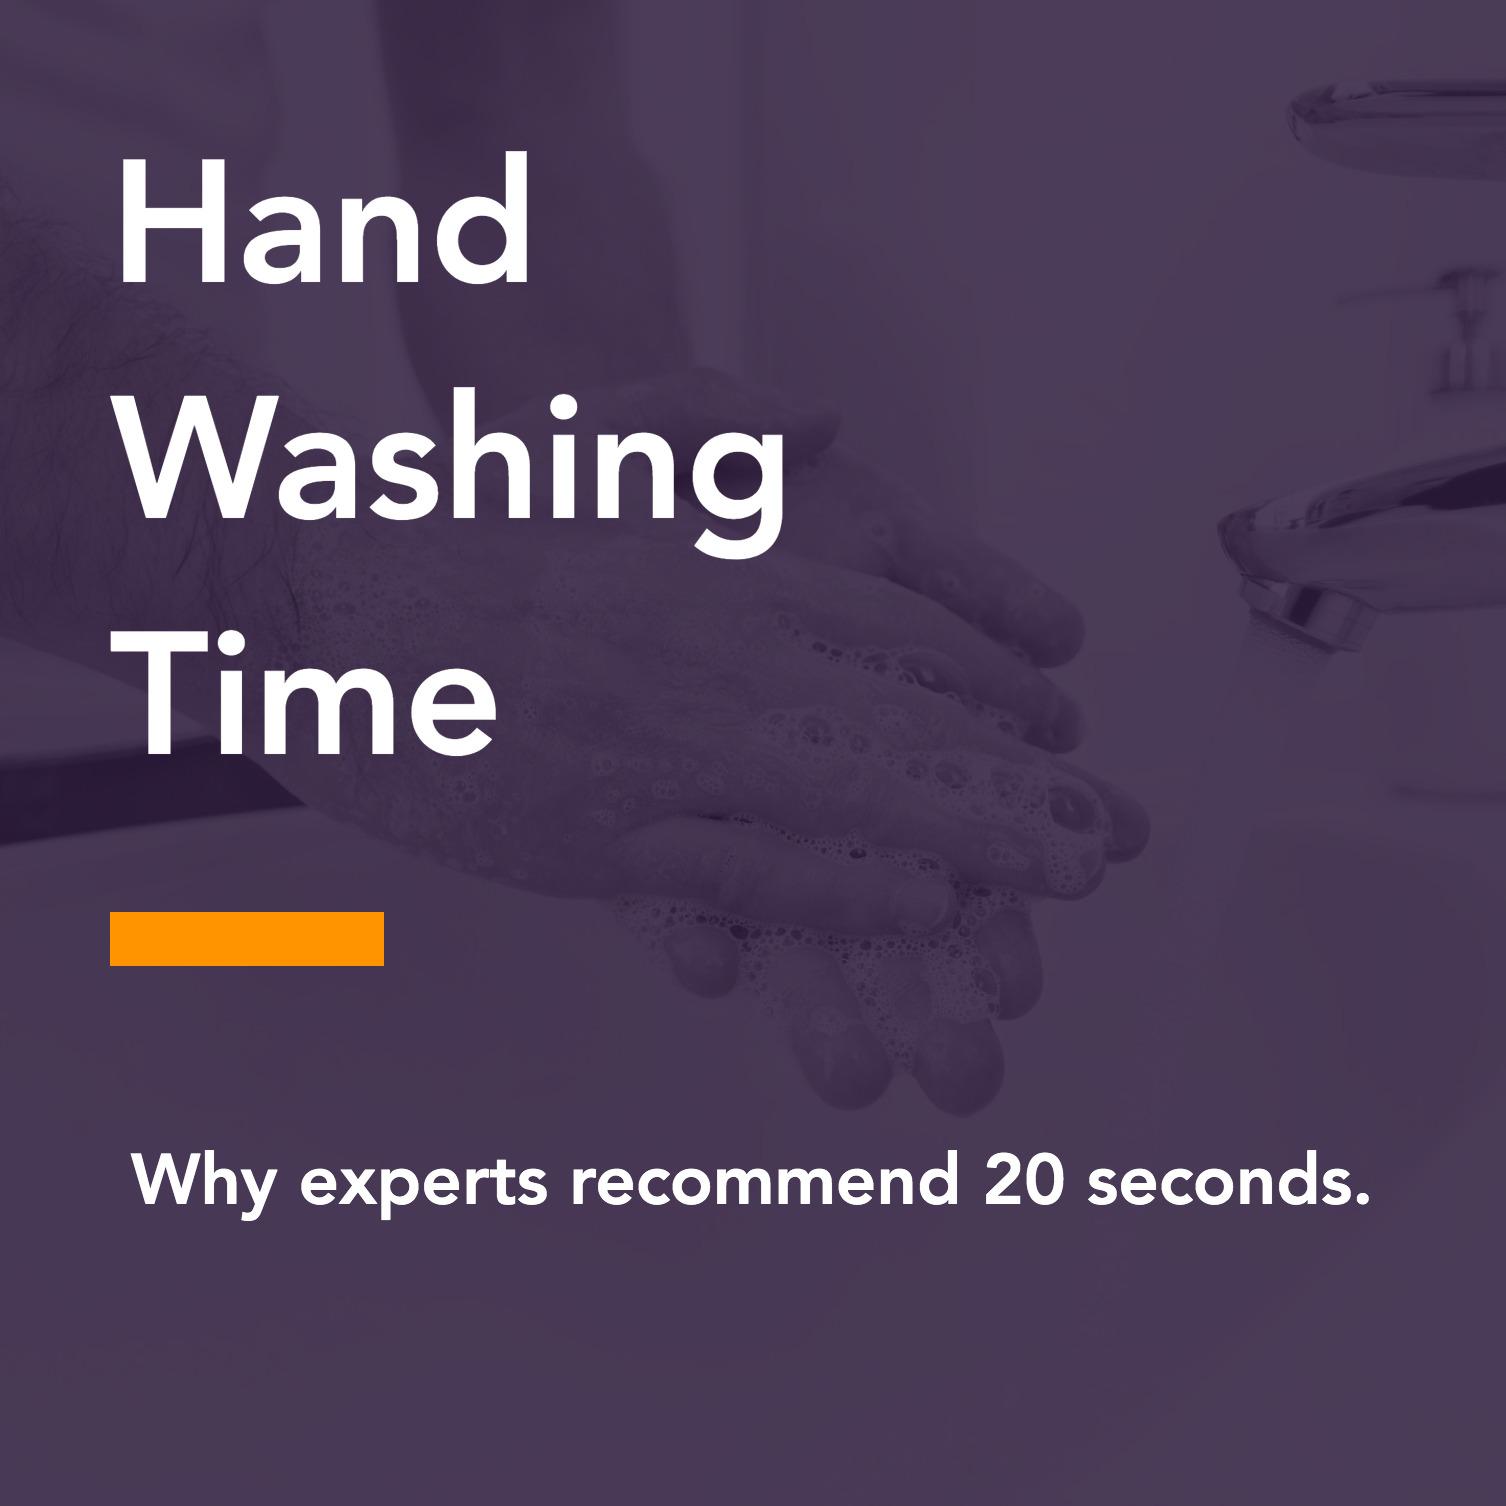 Hand Washing Time